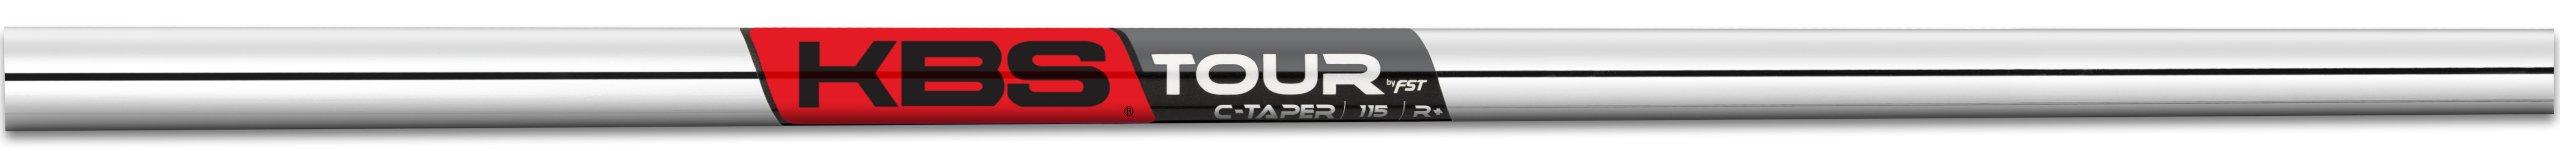 True Temper Men's C-Taper R+ Golf Club Shaft, 115gm, Steel, Regular, 4-PW